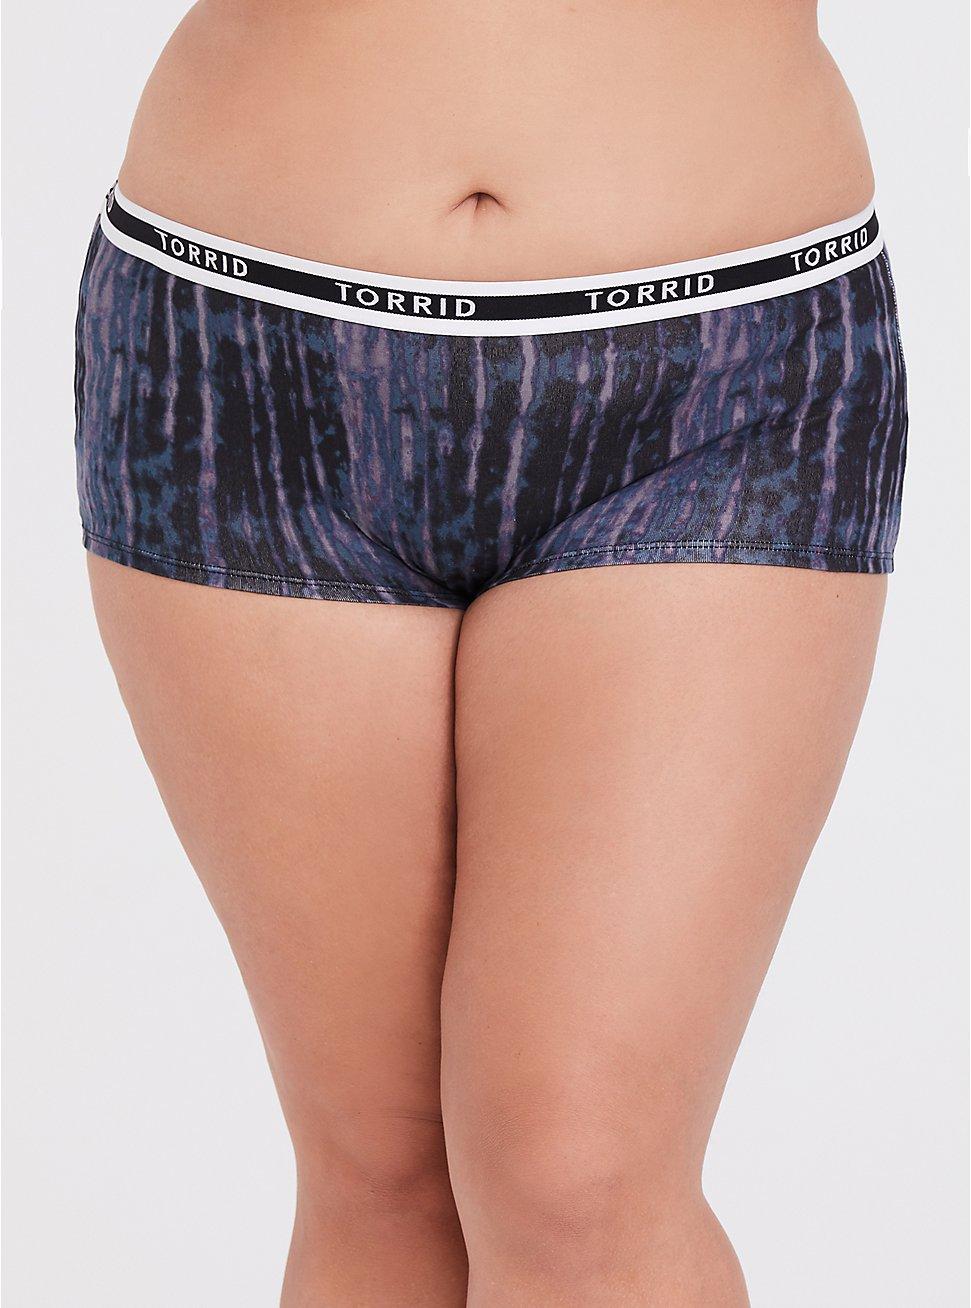 Torrid Logo Purple Tie-Dye Cotton Boyshort Panty, TIE DYE-BLACK, hi-res